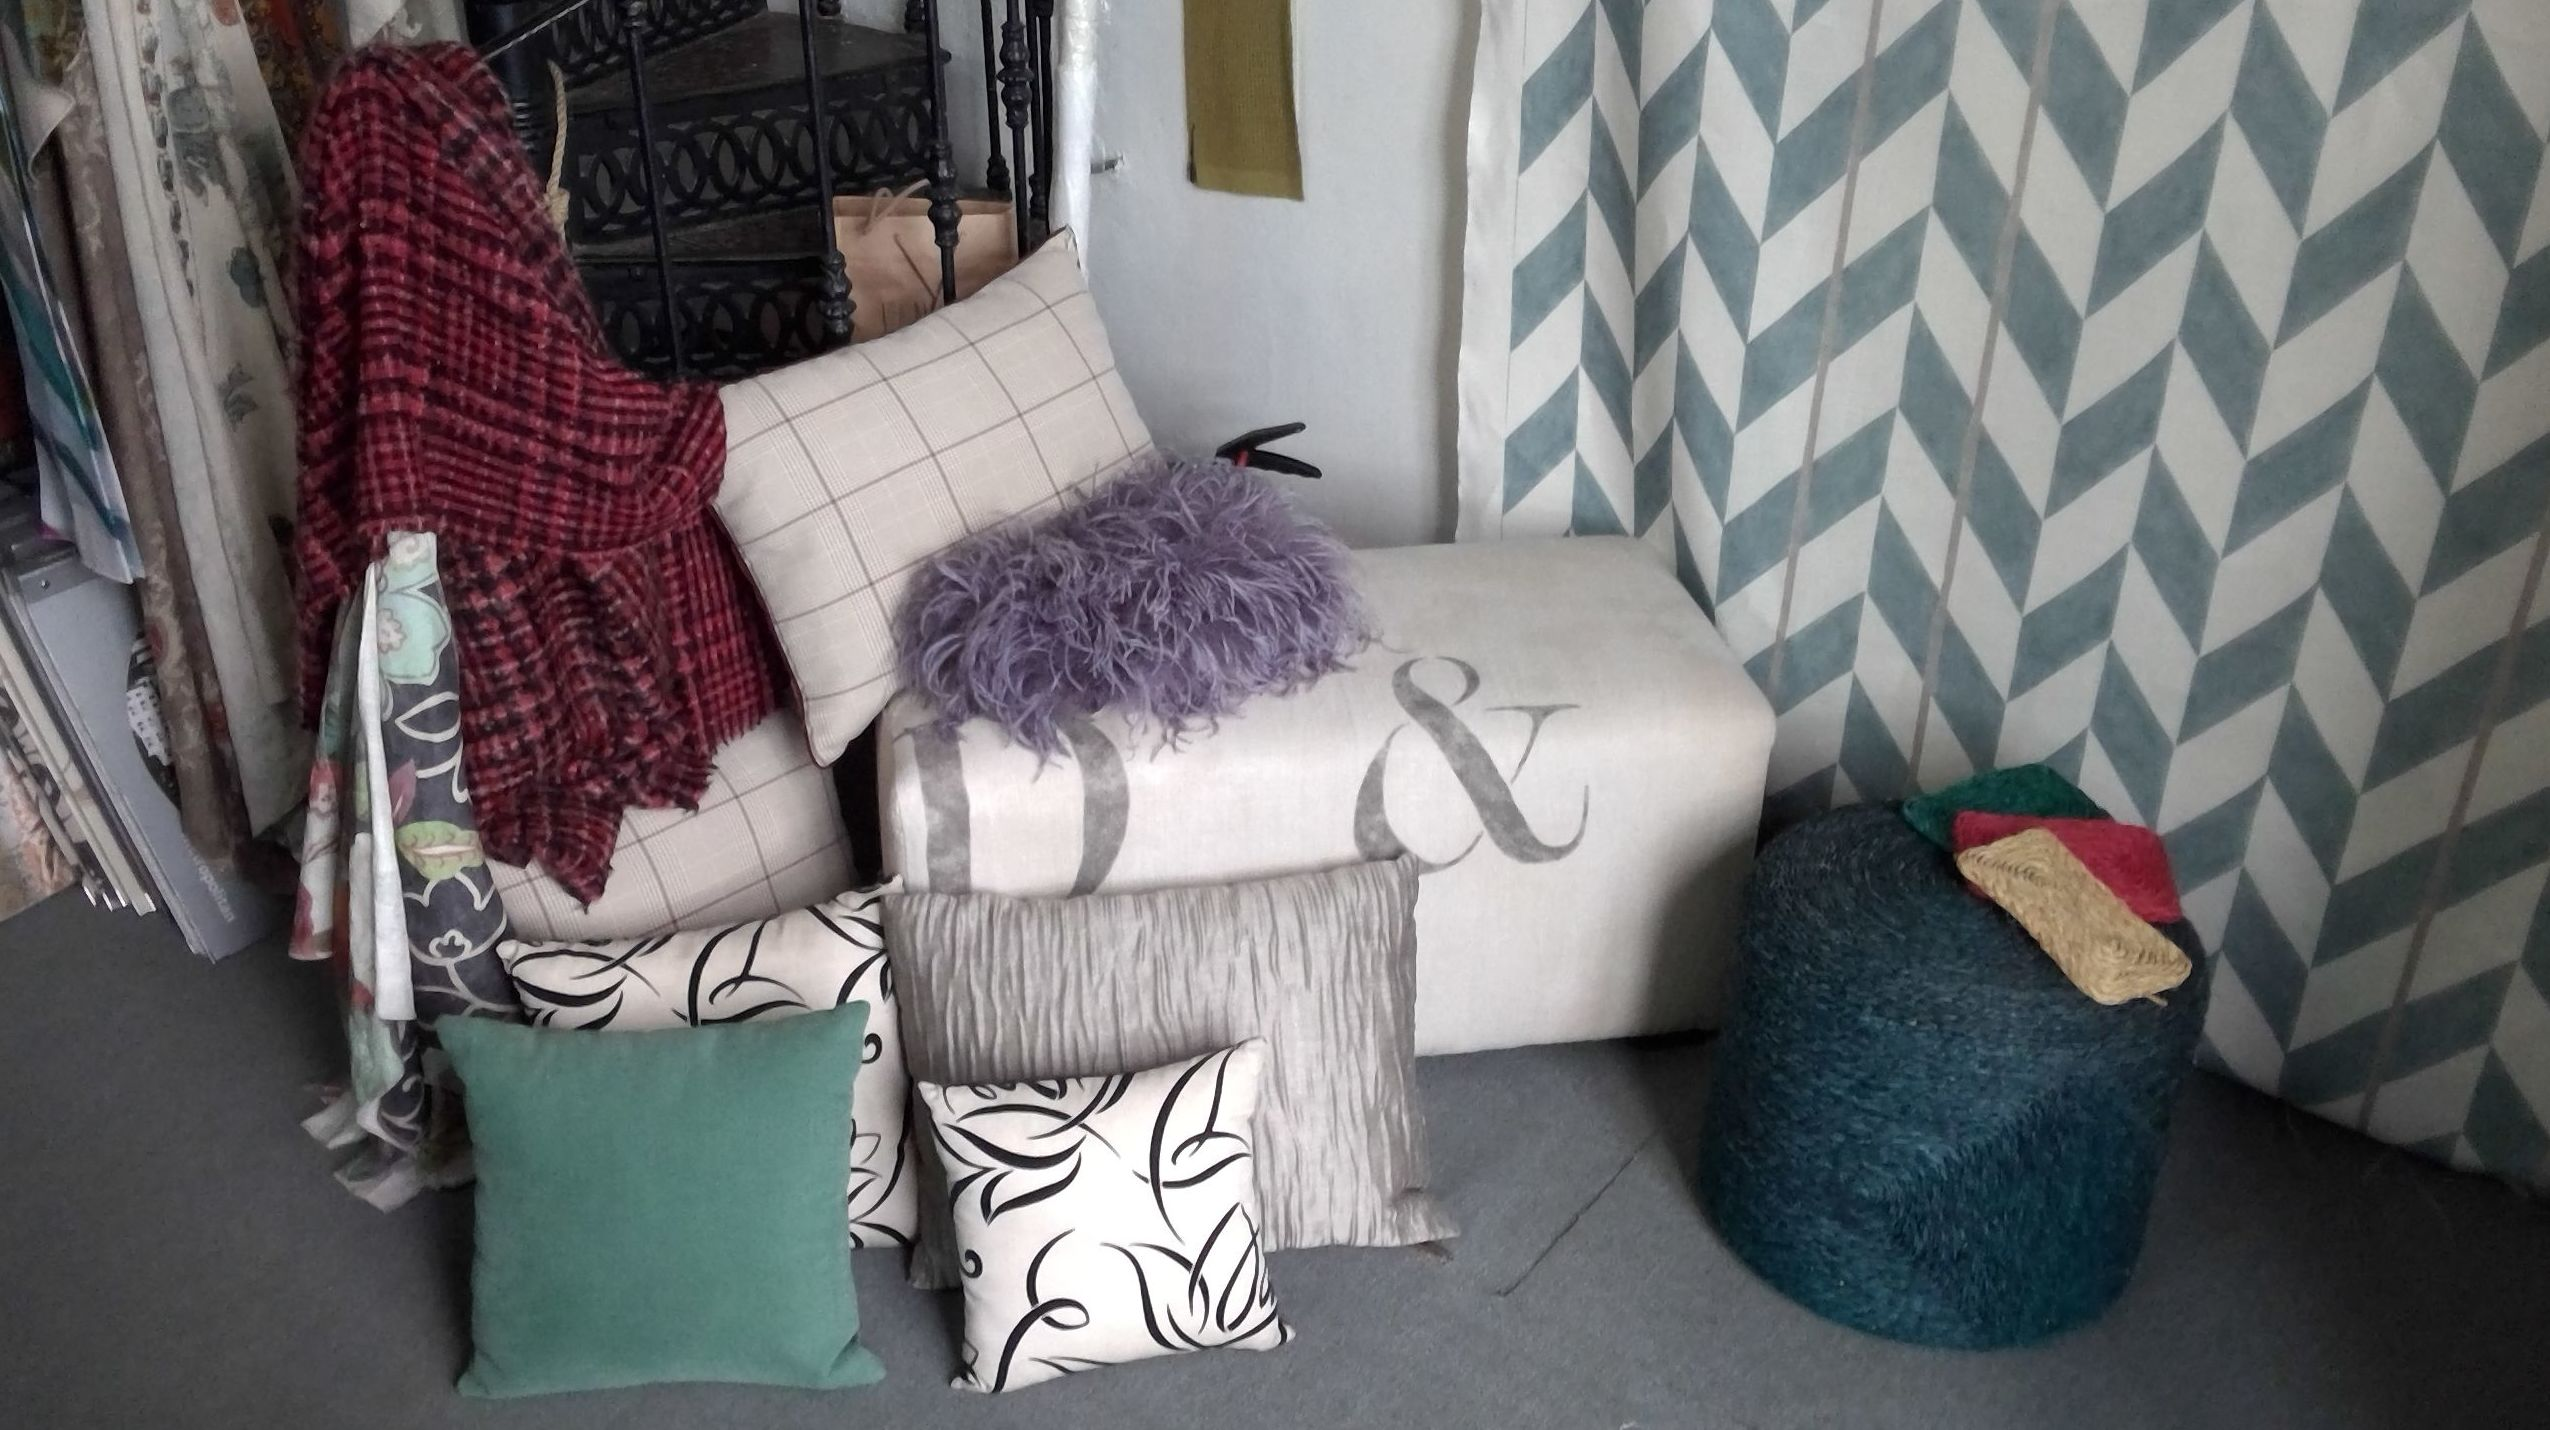 Foto 27 de Decoración textil en Madrid | Diseño Textil